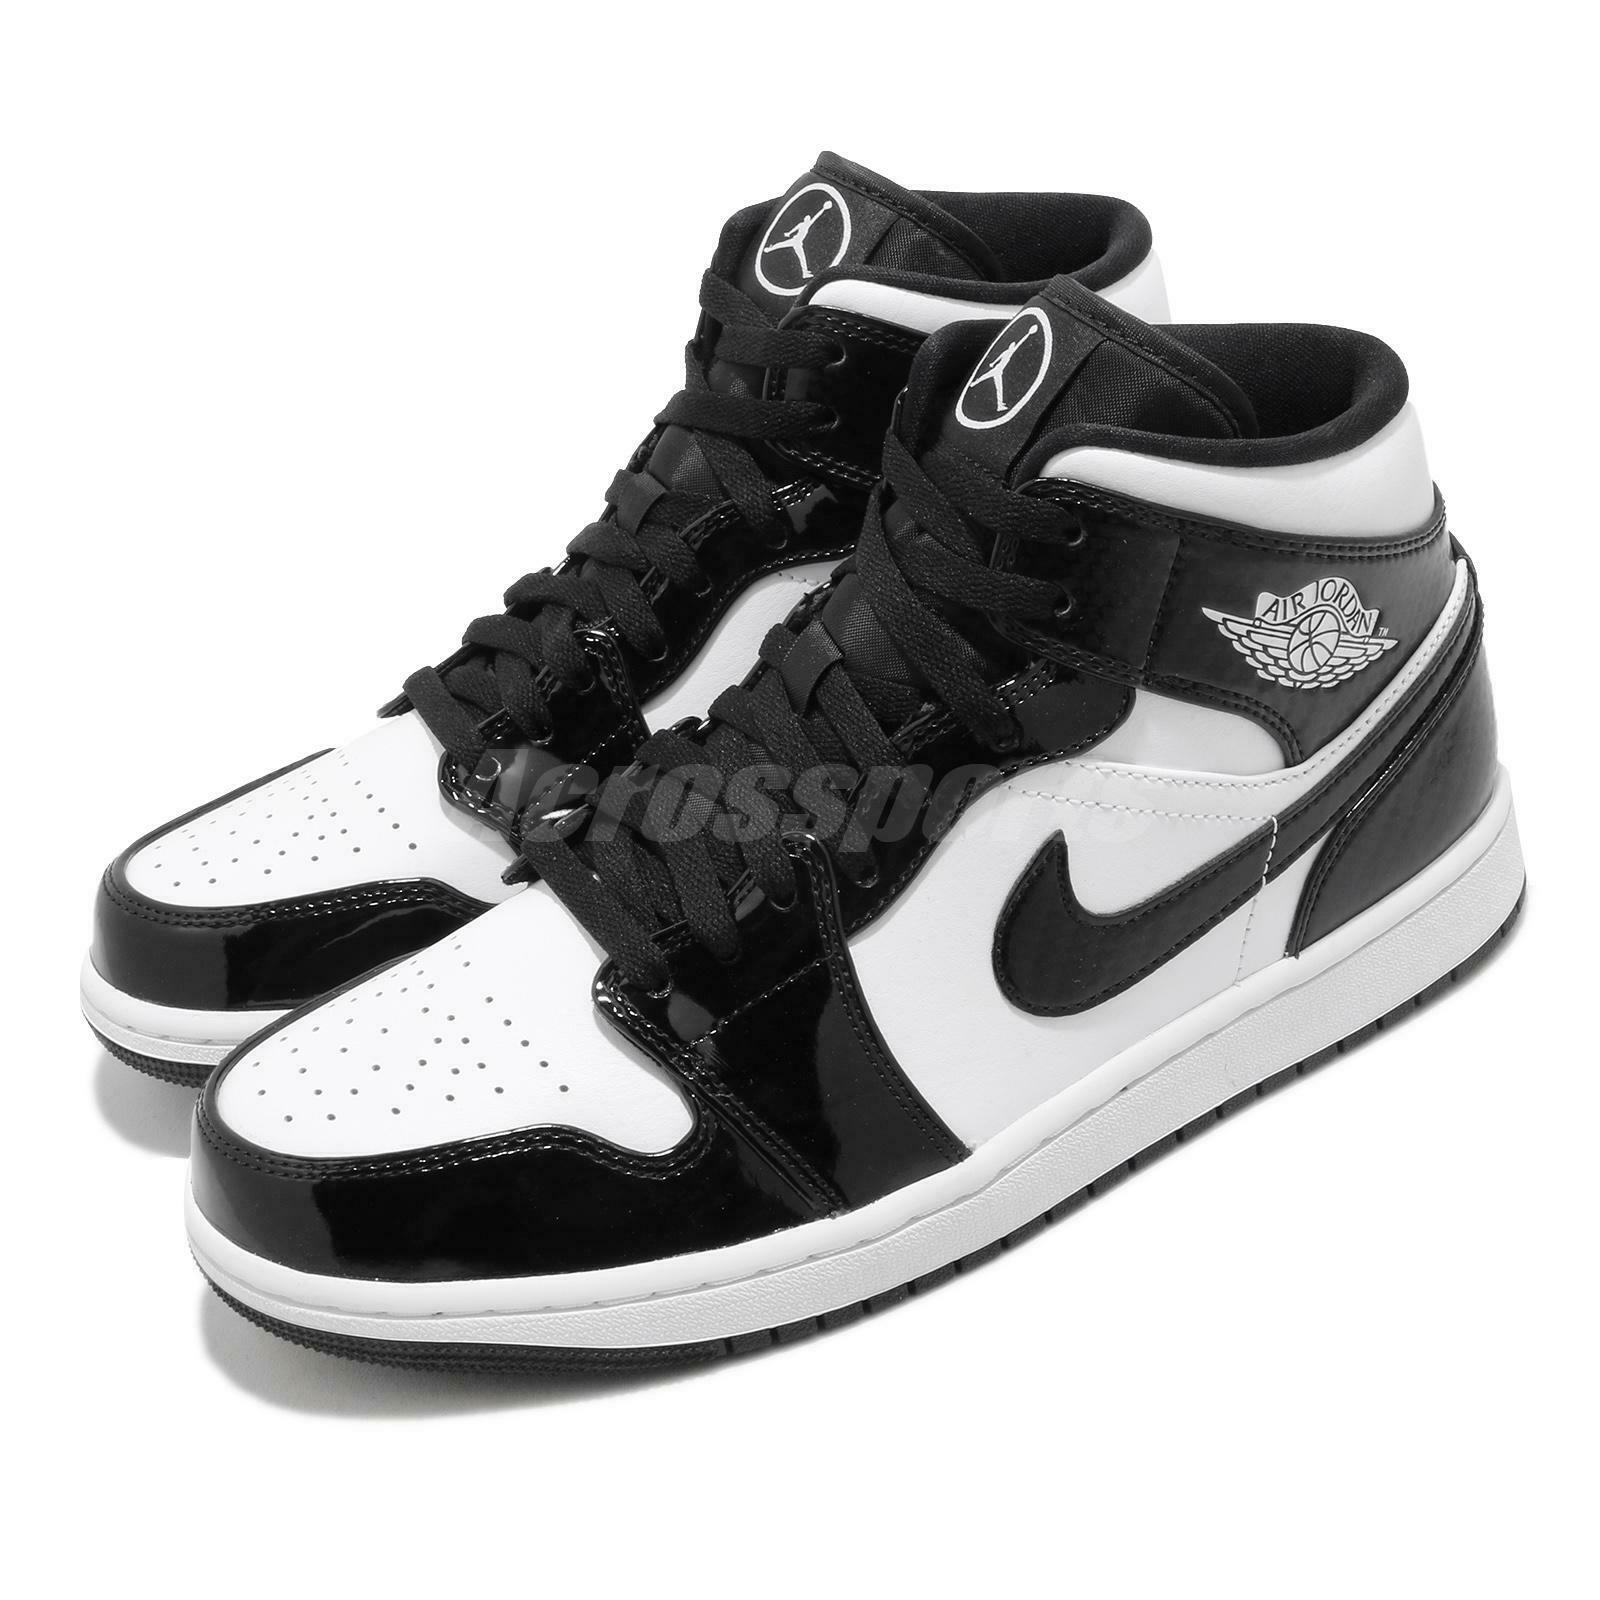 Nike Air Jordan 1 Mid SE ASW AJ1 All Star 2021 Black White Men ...